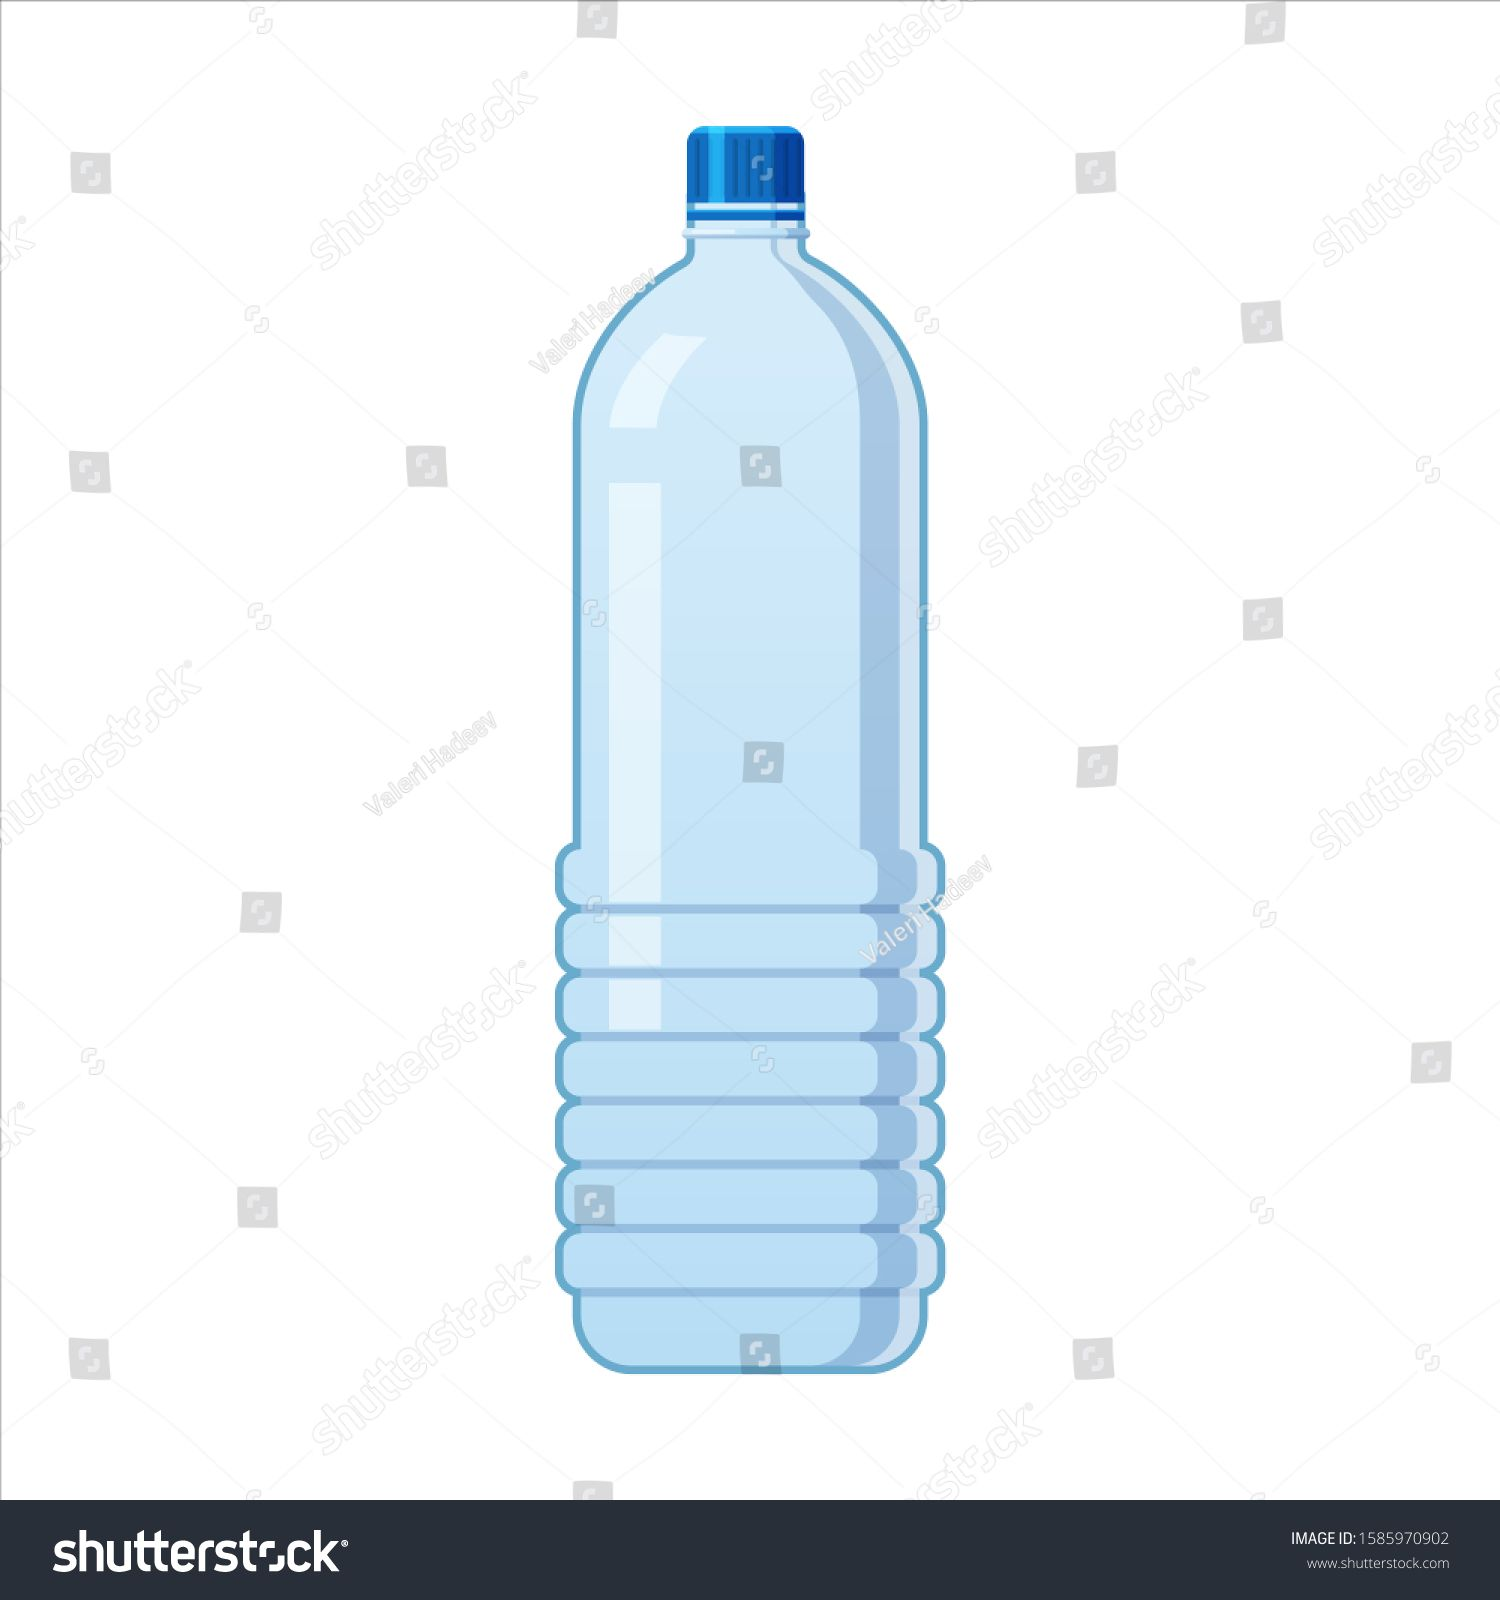 Mineral Water Bottle Png Is A Free Transparent Background Clipart Image Uploaded By Biljana N Download It For Mineral Water Bottle Mineral Water Water Bottle